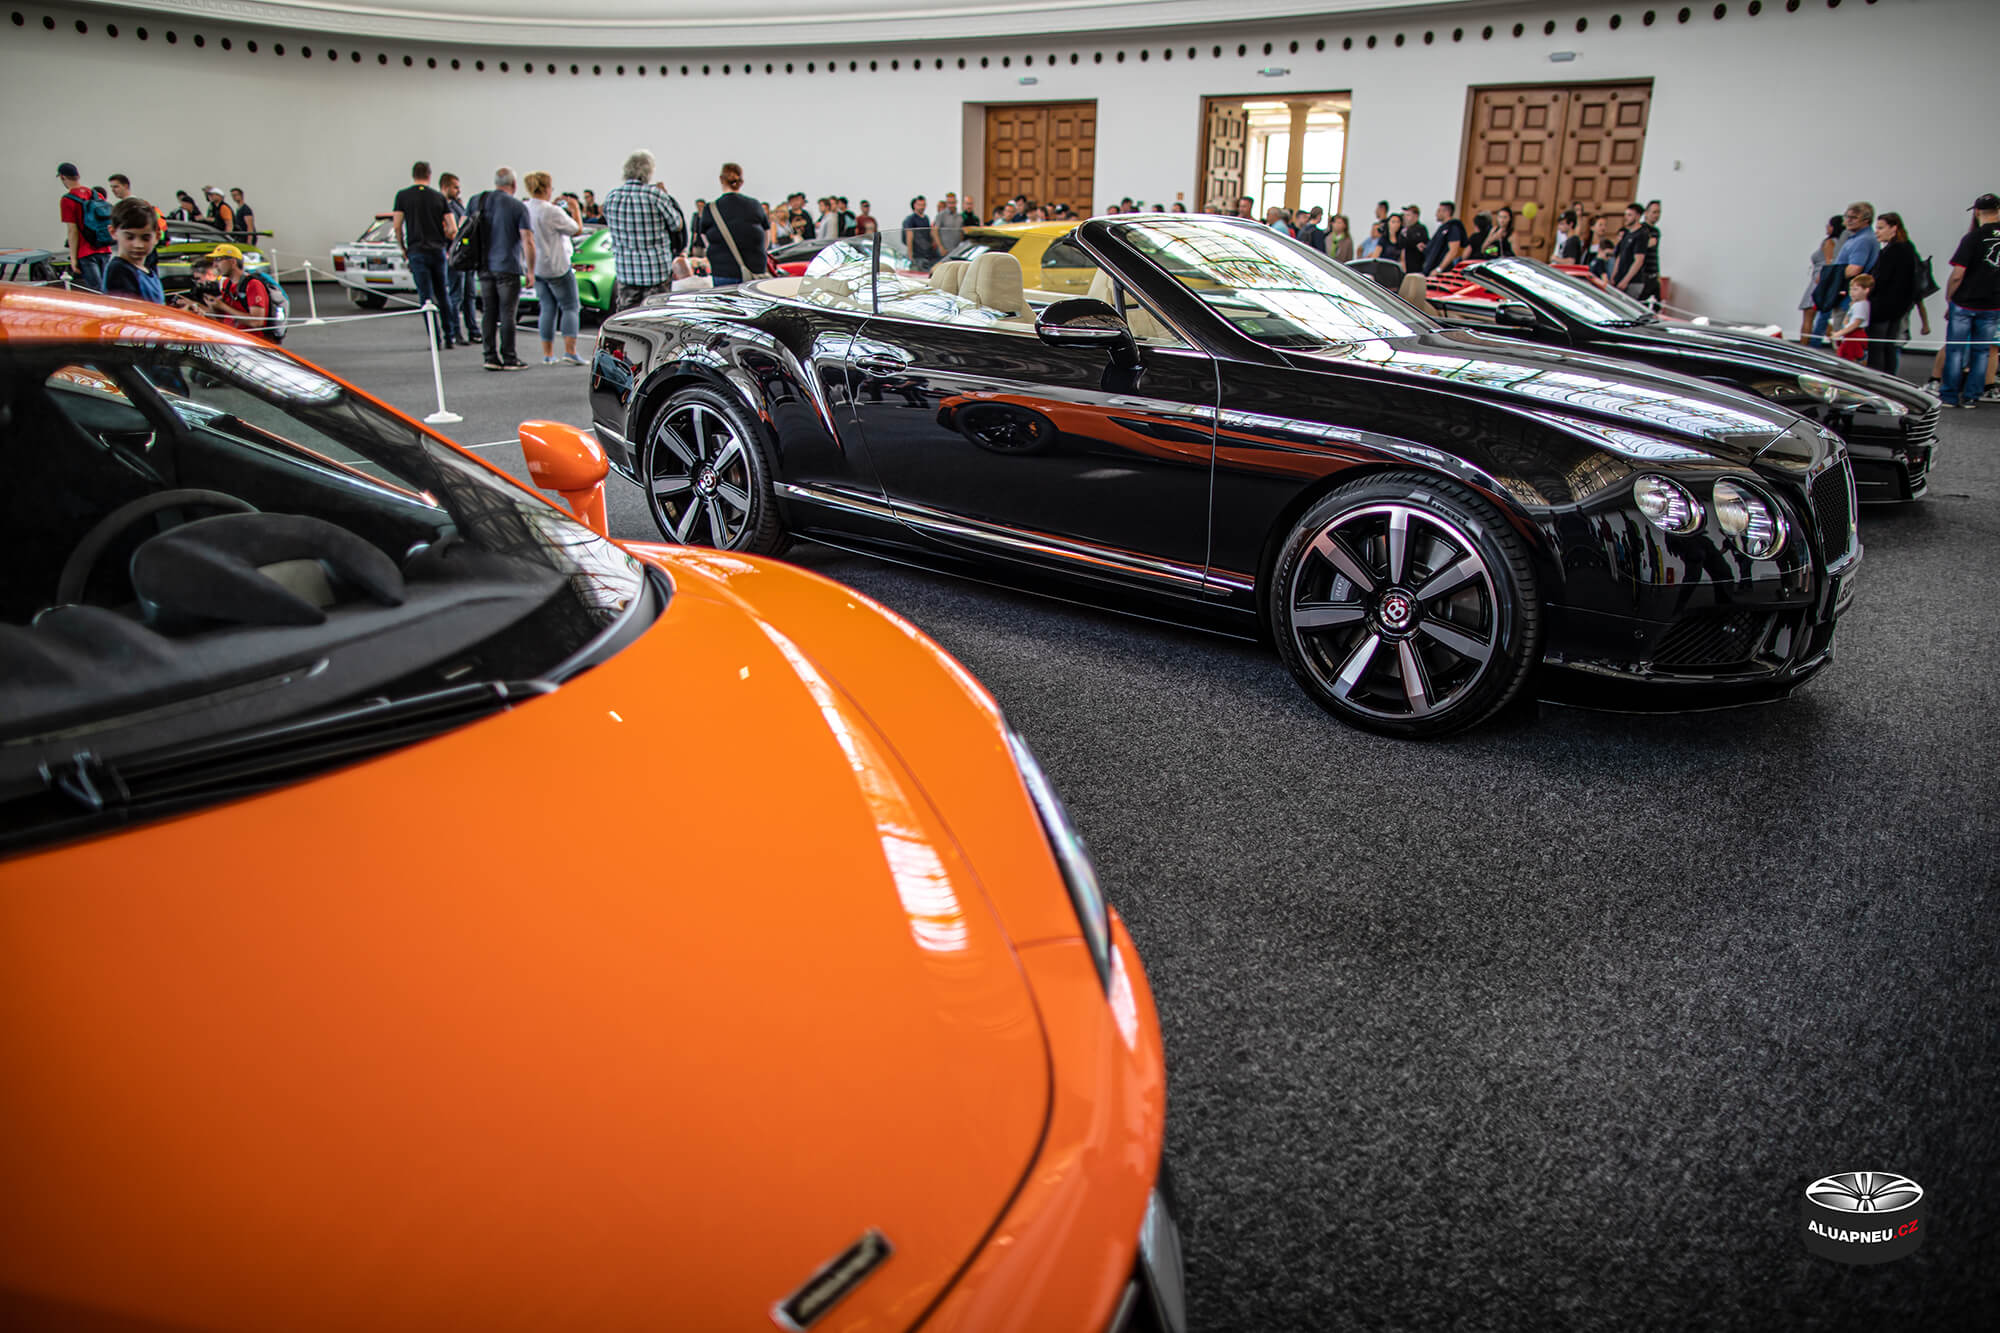 Leštěné elektrony Bentley Continental cabrio - Automobilové Legendy 2019 - www.aluapneu.cz